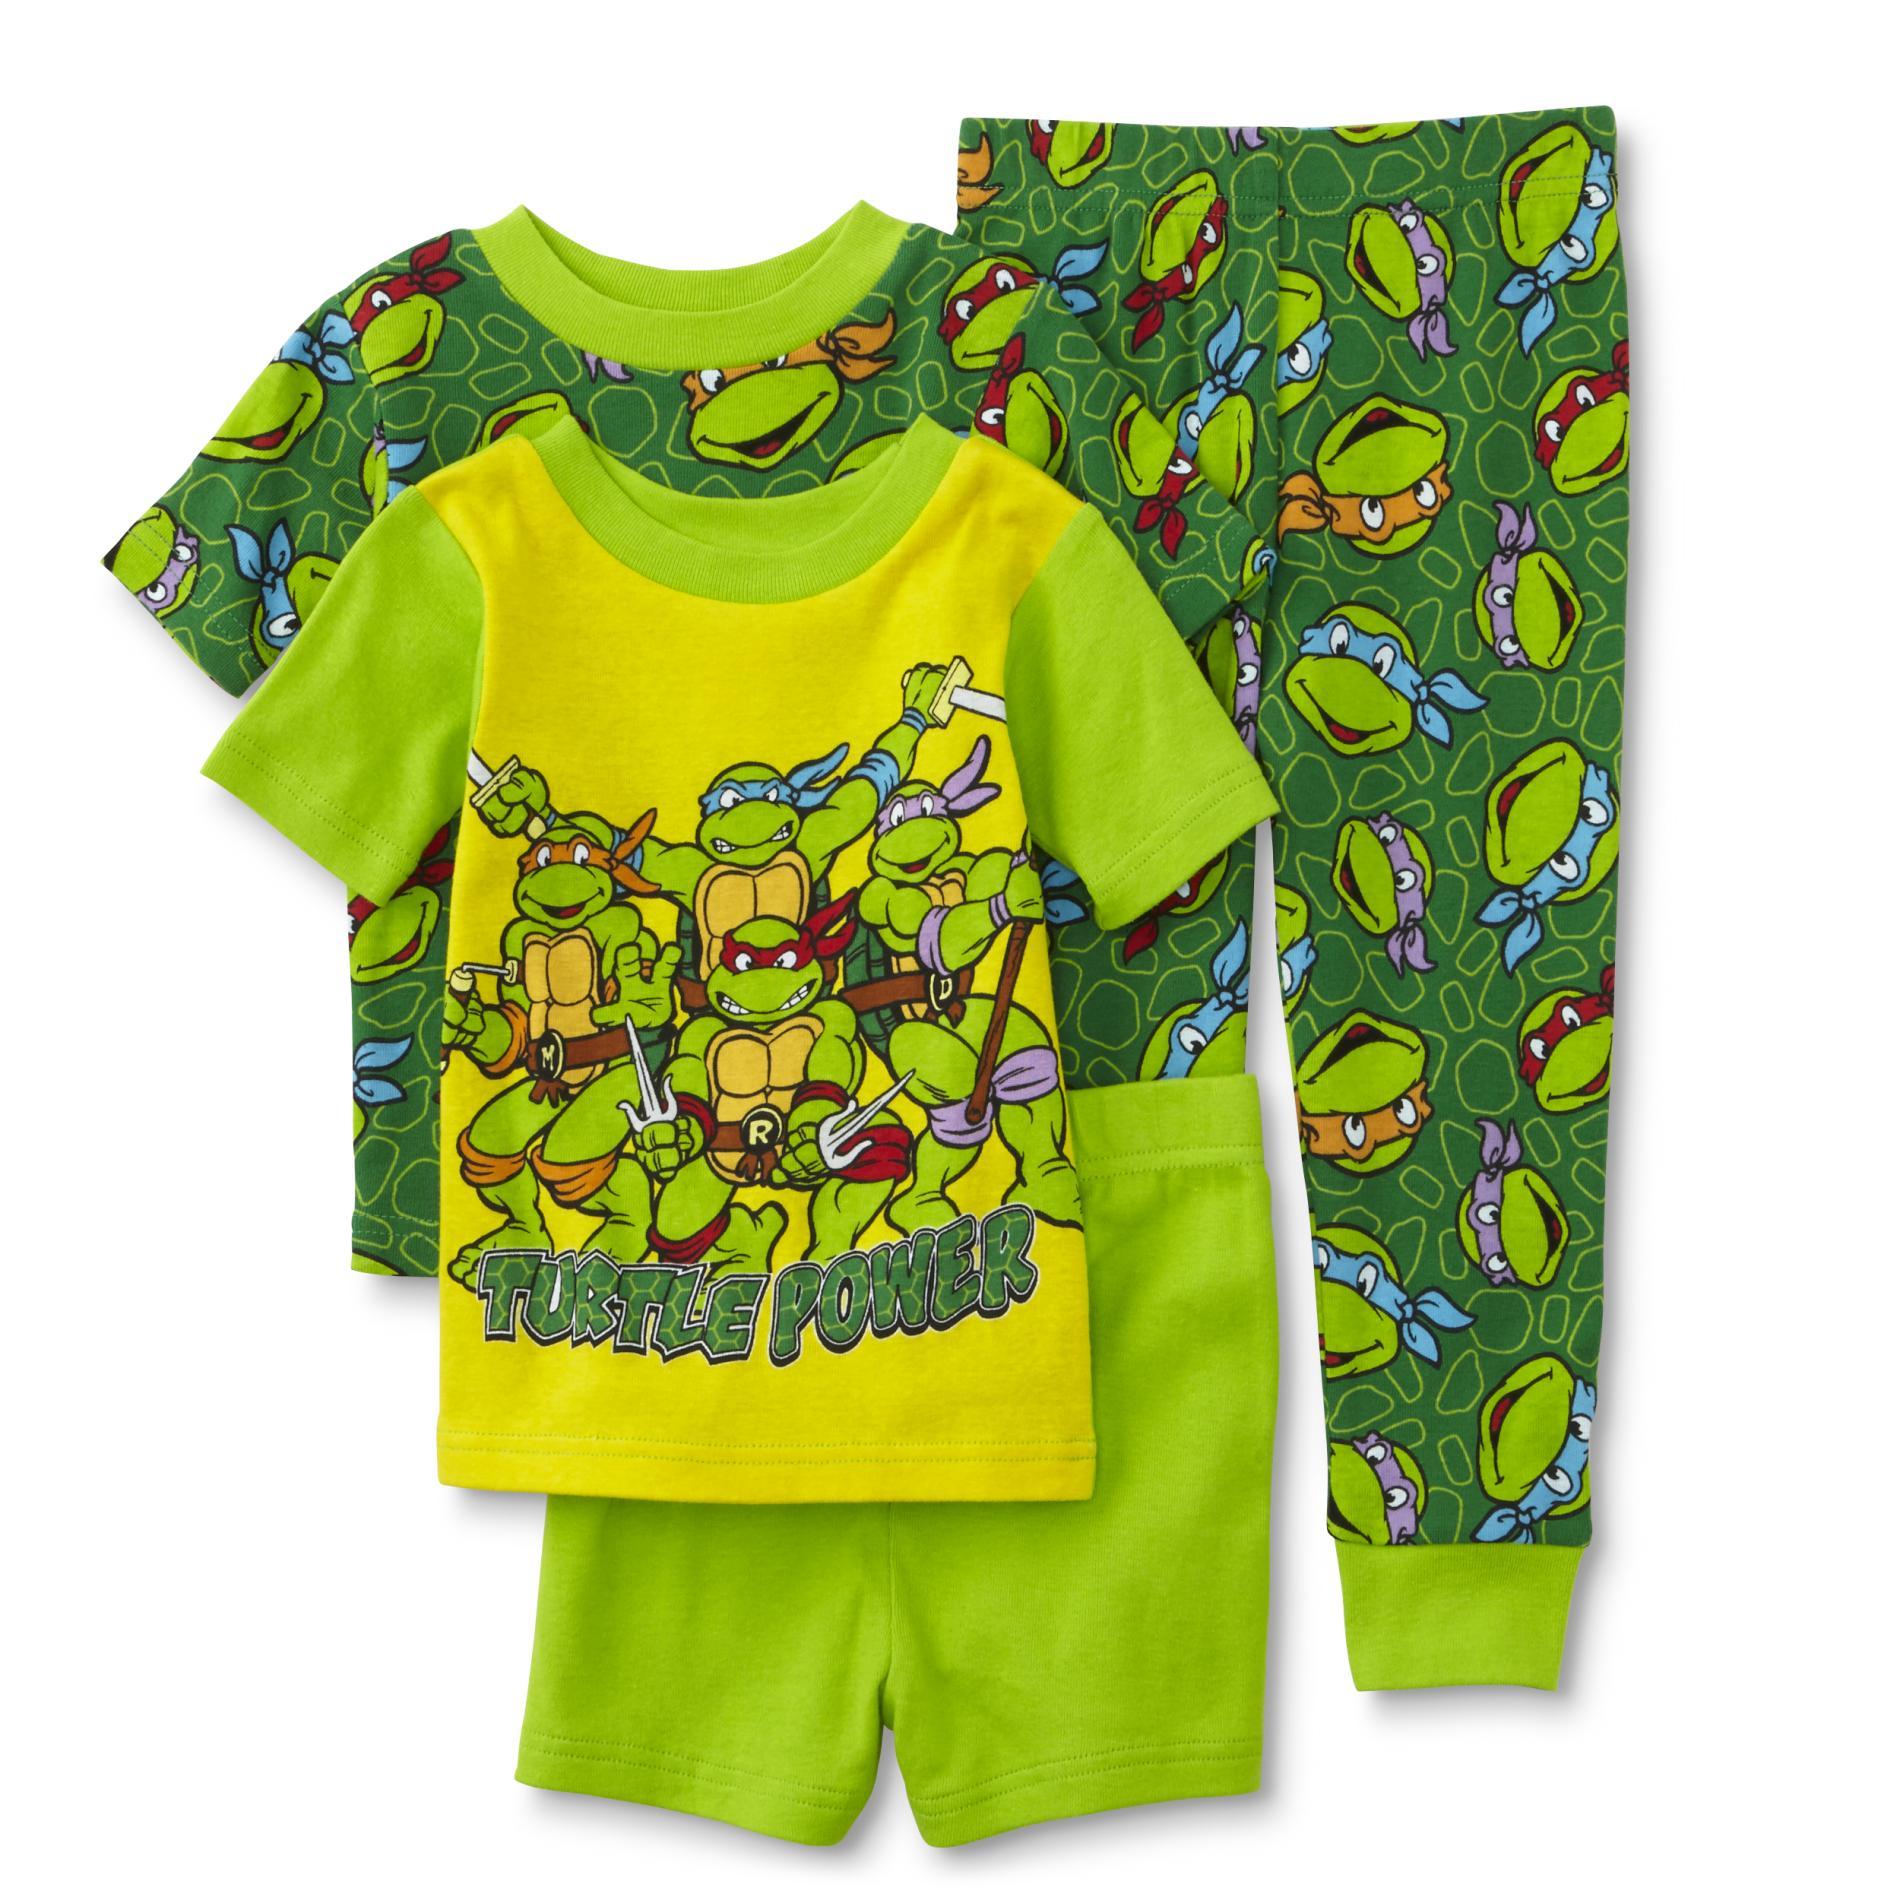 Nickelodeon Teenage Mutant Ninja Turtles Toddler Boy's 2-Pairs Pajamas